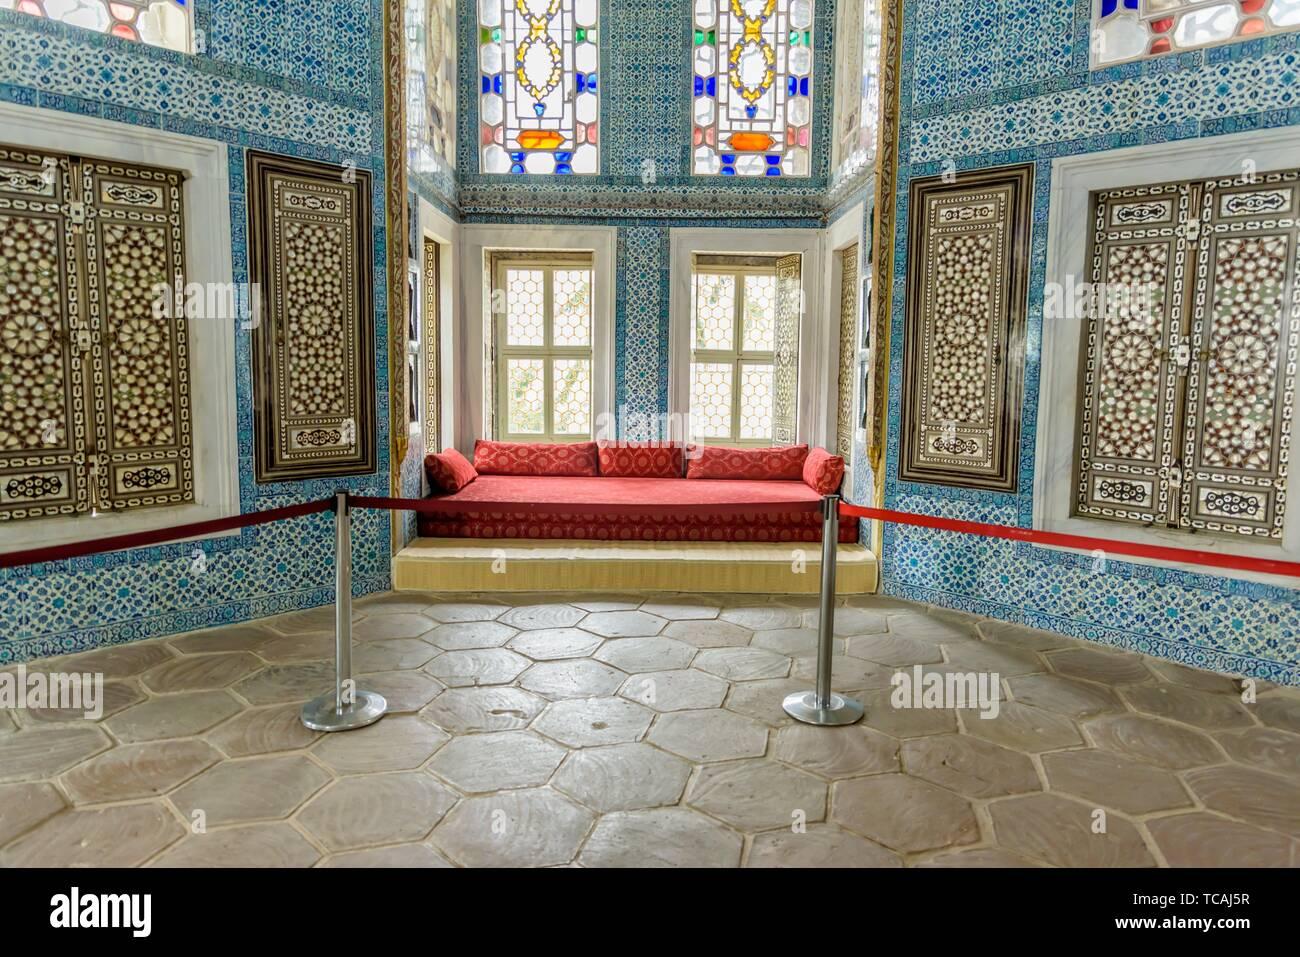 Revan kiosk locates at Topkapi Palace, a large museum destination,in Istanbul,Turkey. 11 April 2018. Stock Photo